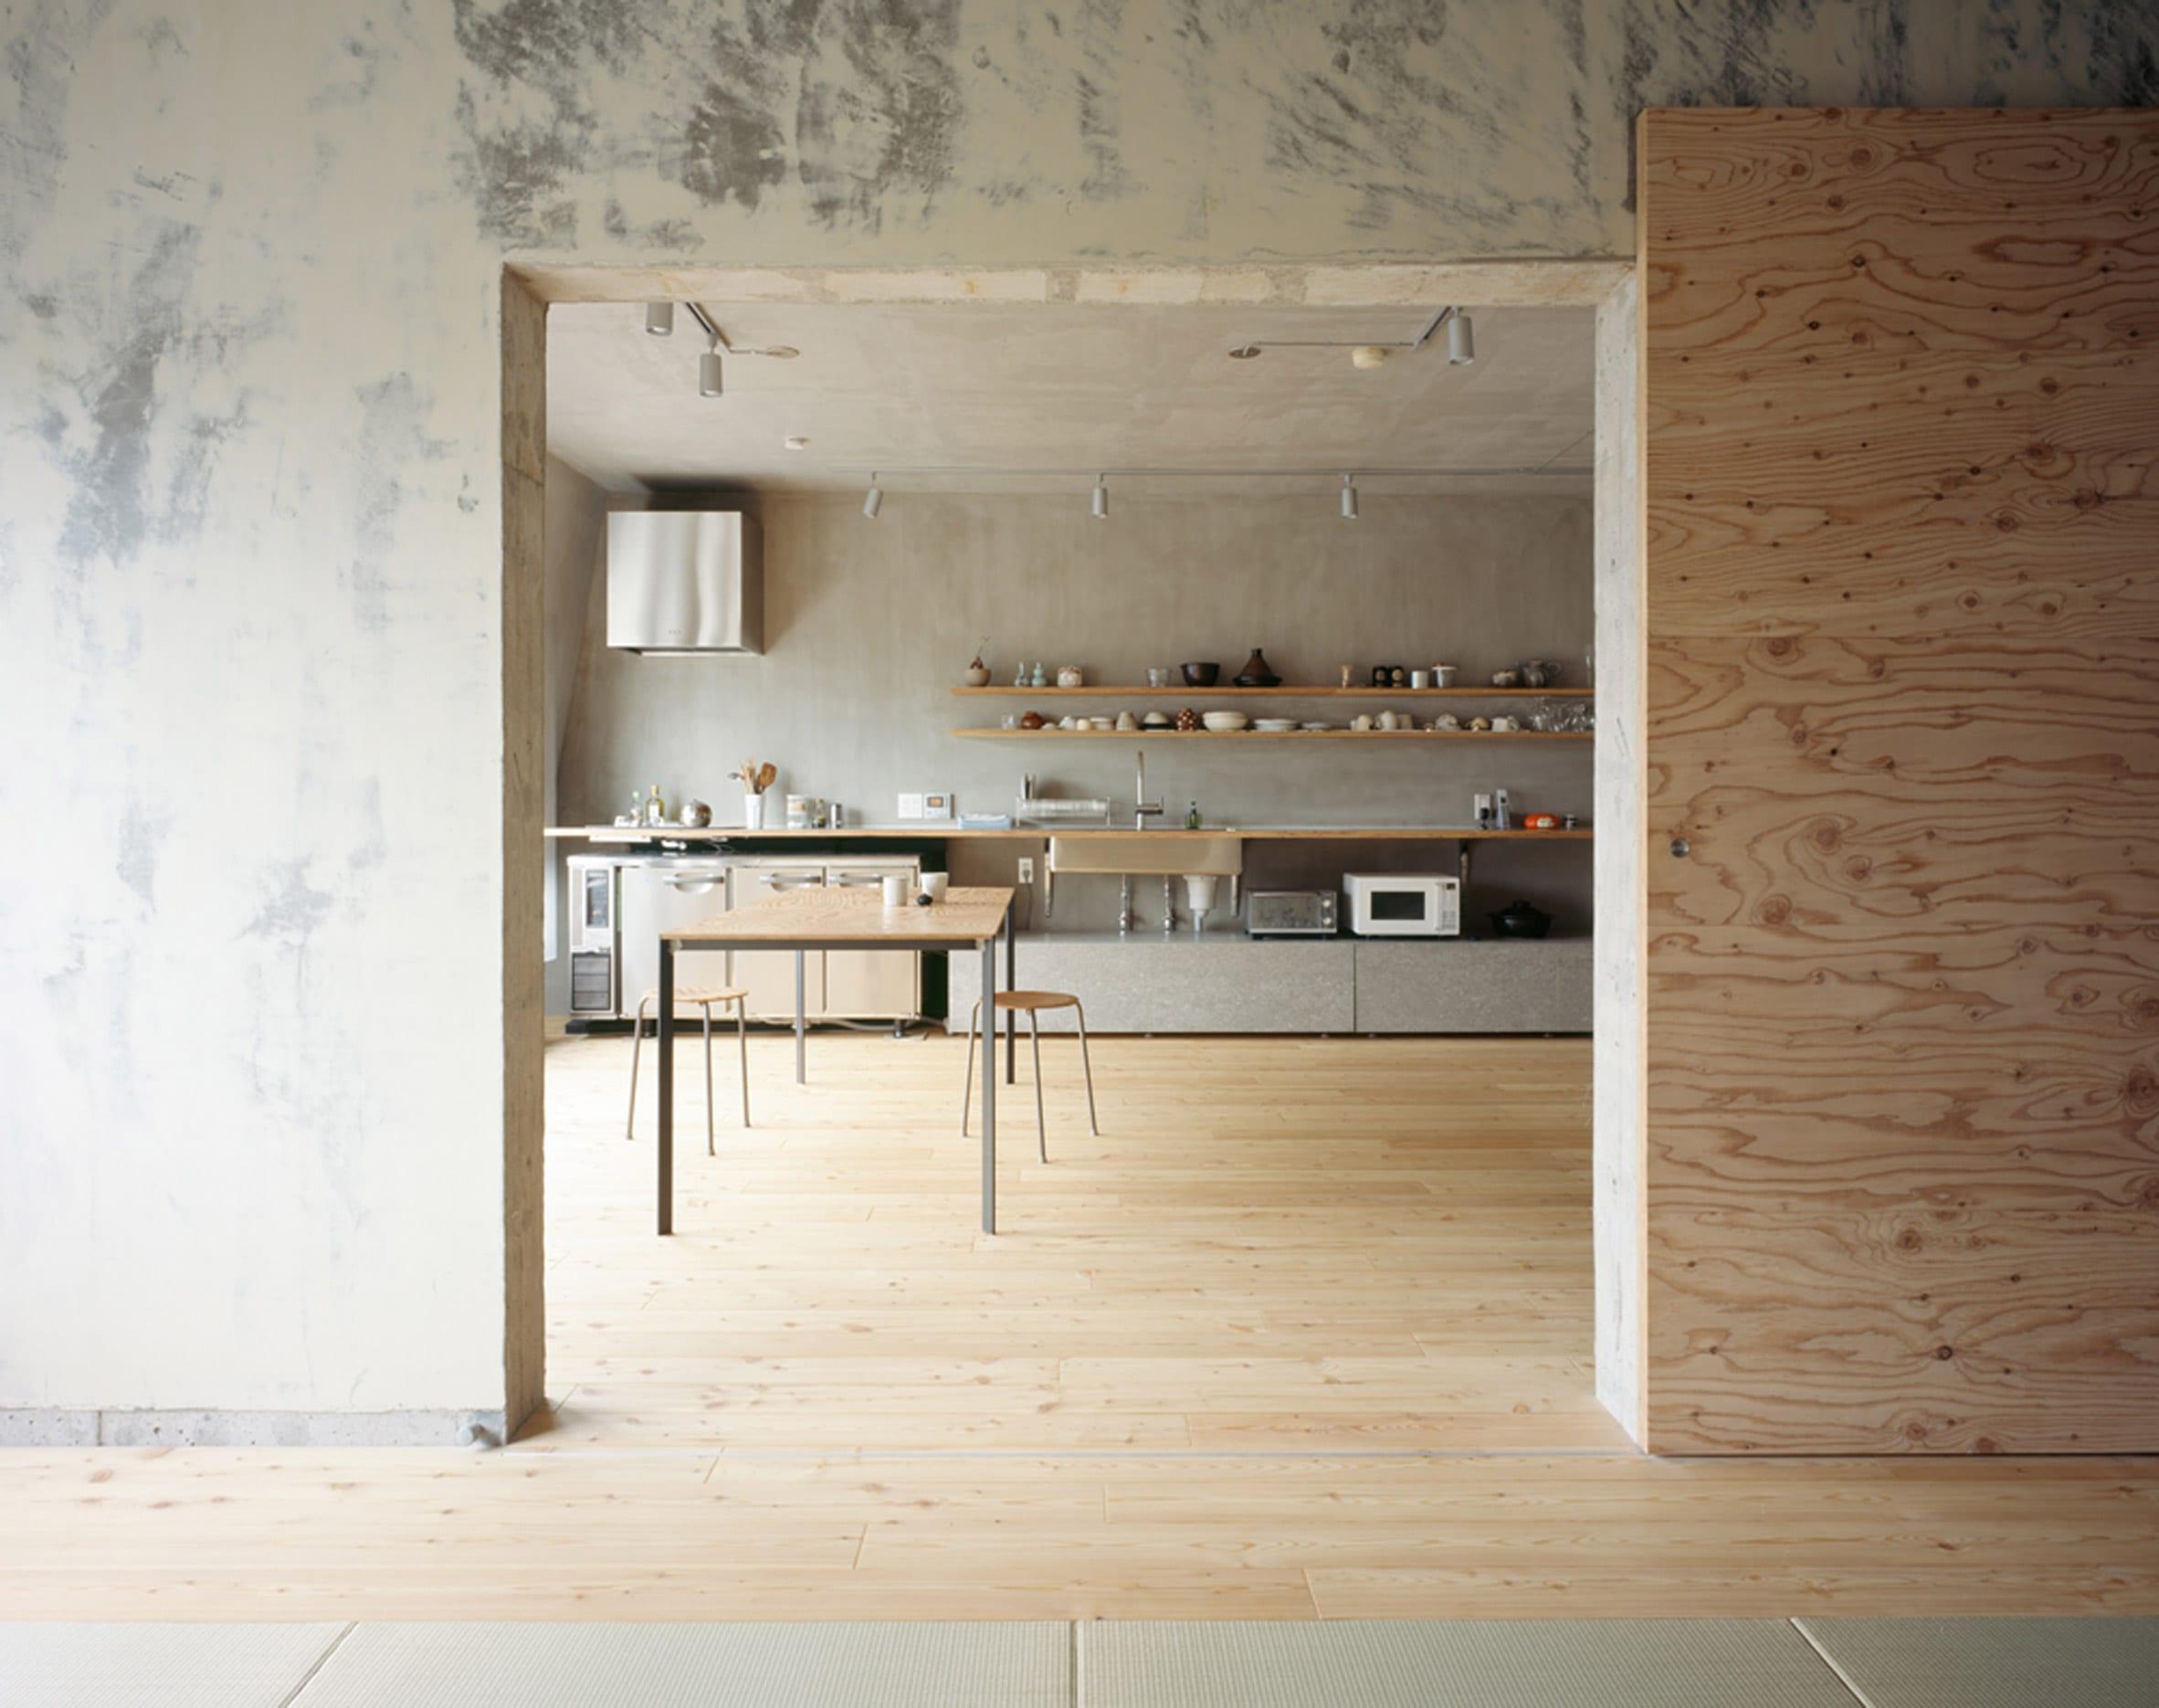 A one-wall kitchen by Naruse Inokuma Architects